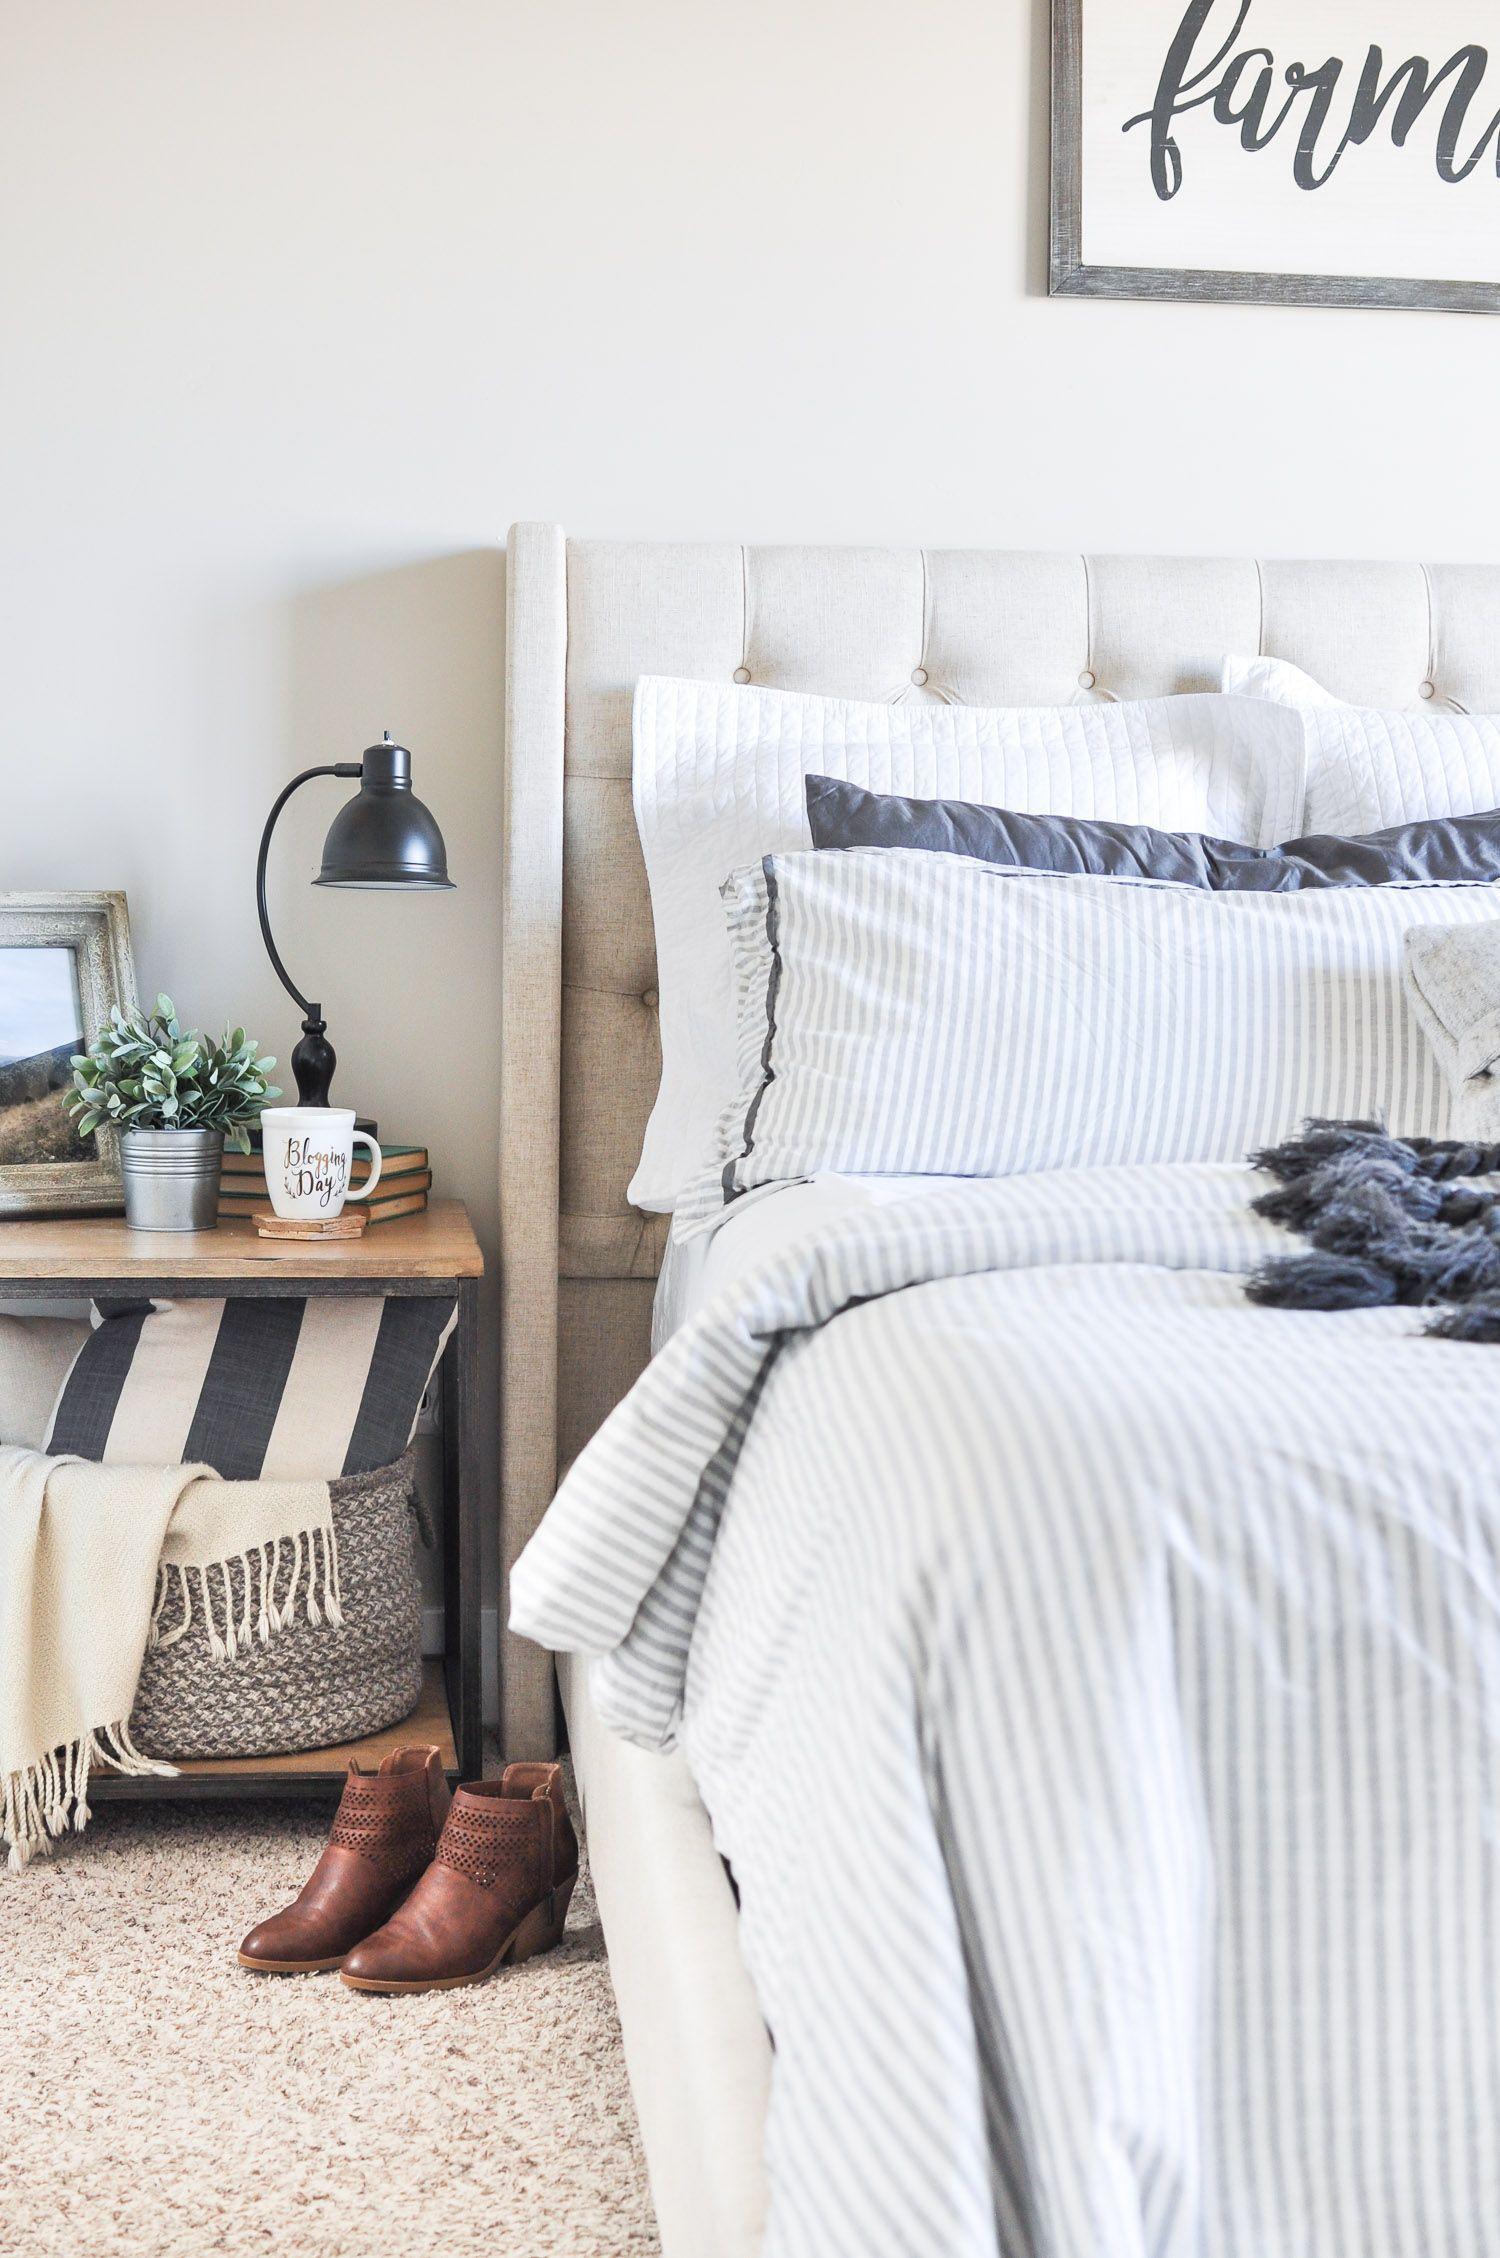 Farmhouse Addition Home Design Ideas Pictures Remodel And Decor: Remodel Bedroom, Bedroom Furniture Design